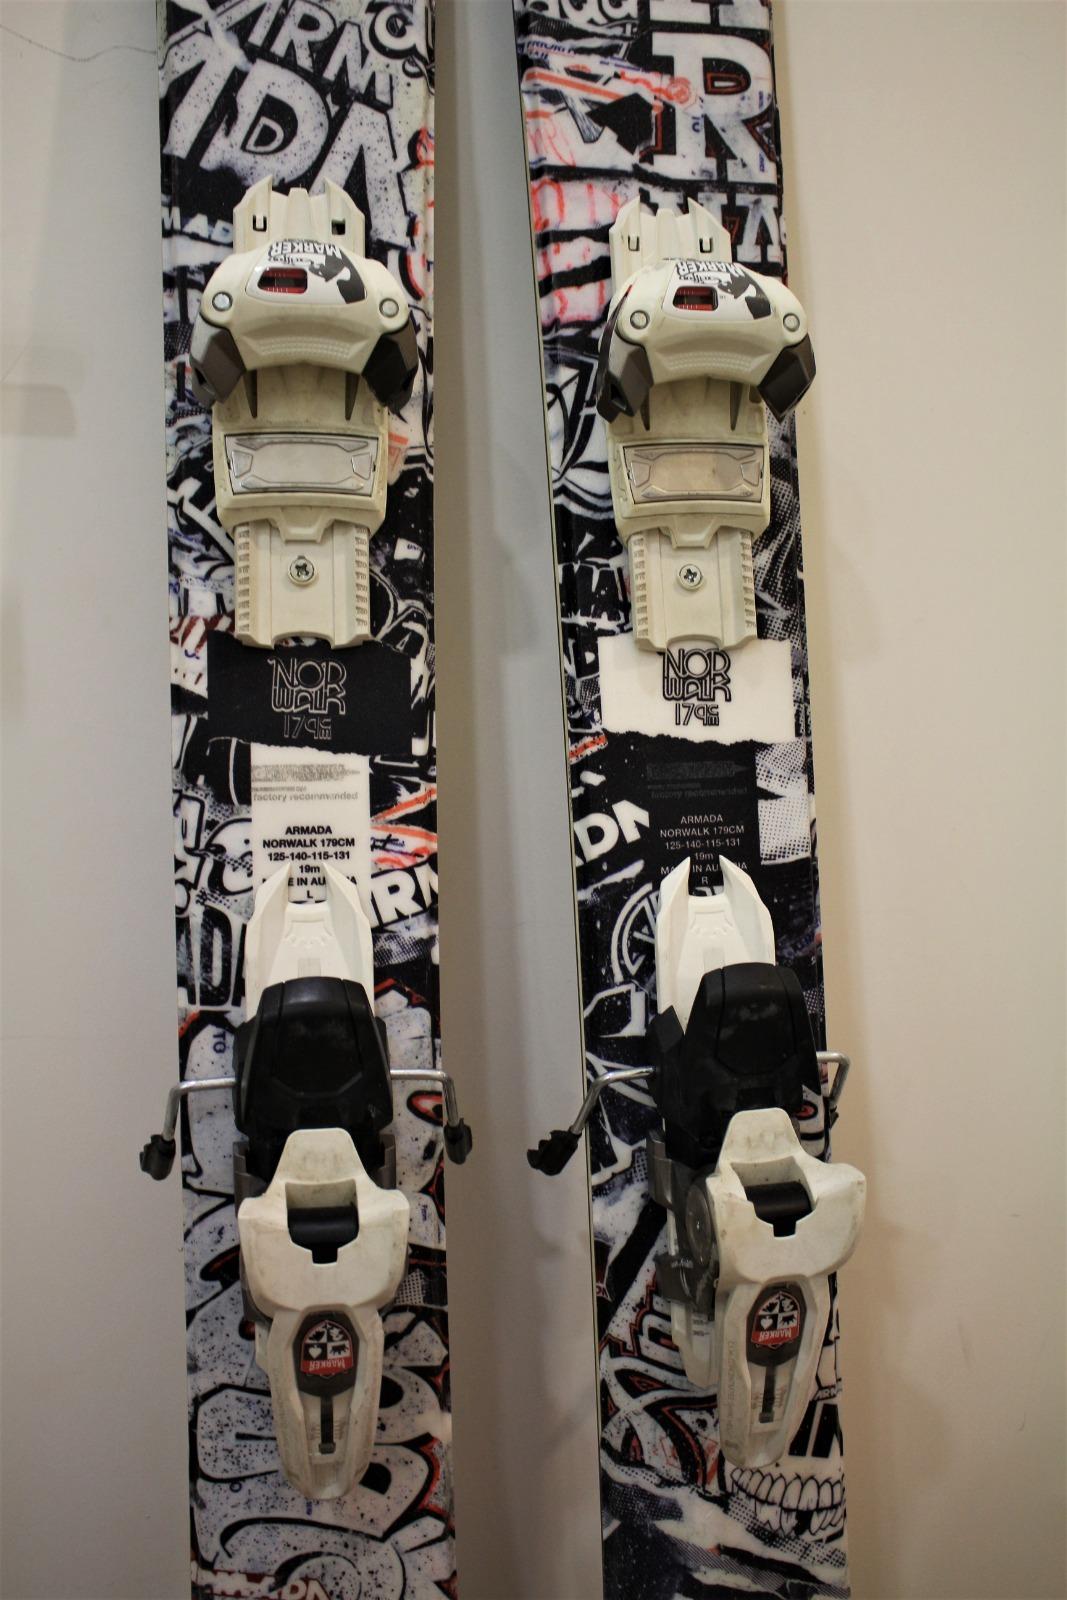 Armada Norwalk 2014 super-sick powder skis